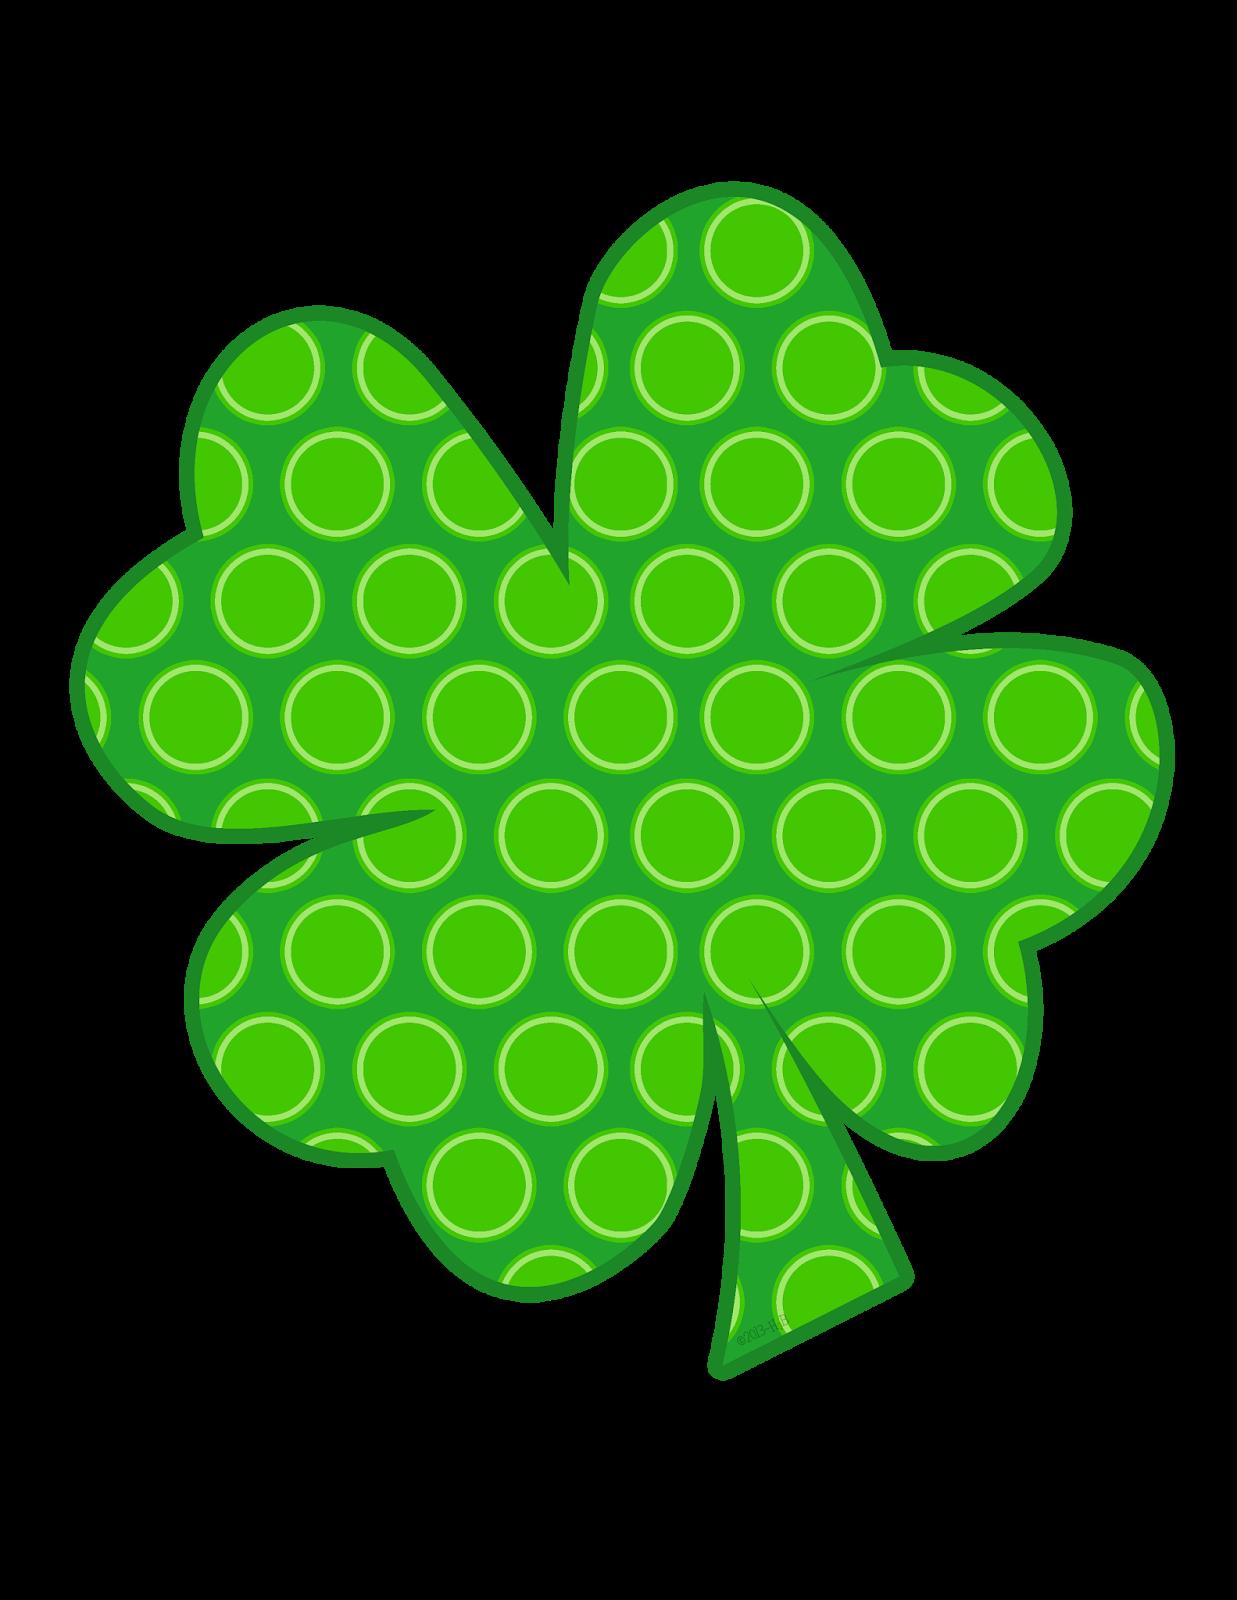 Clover march flower